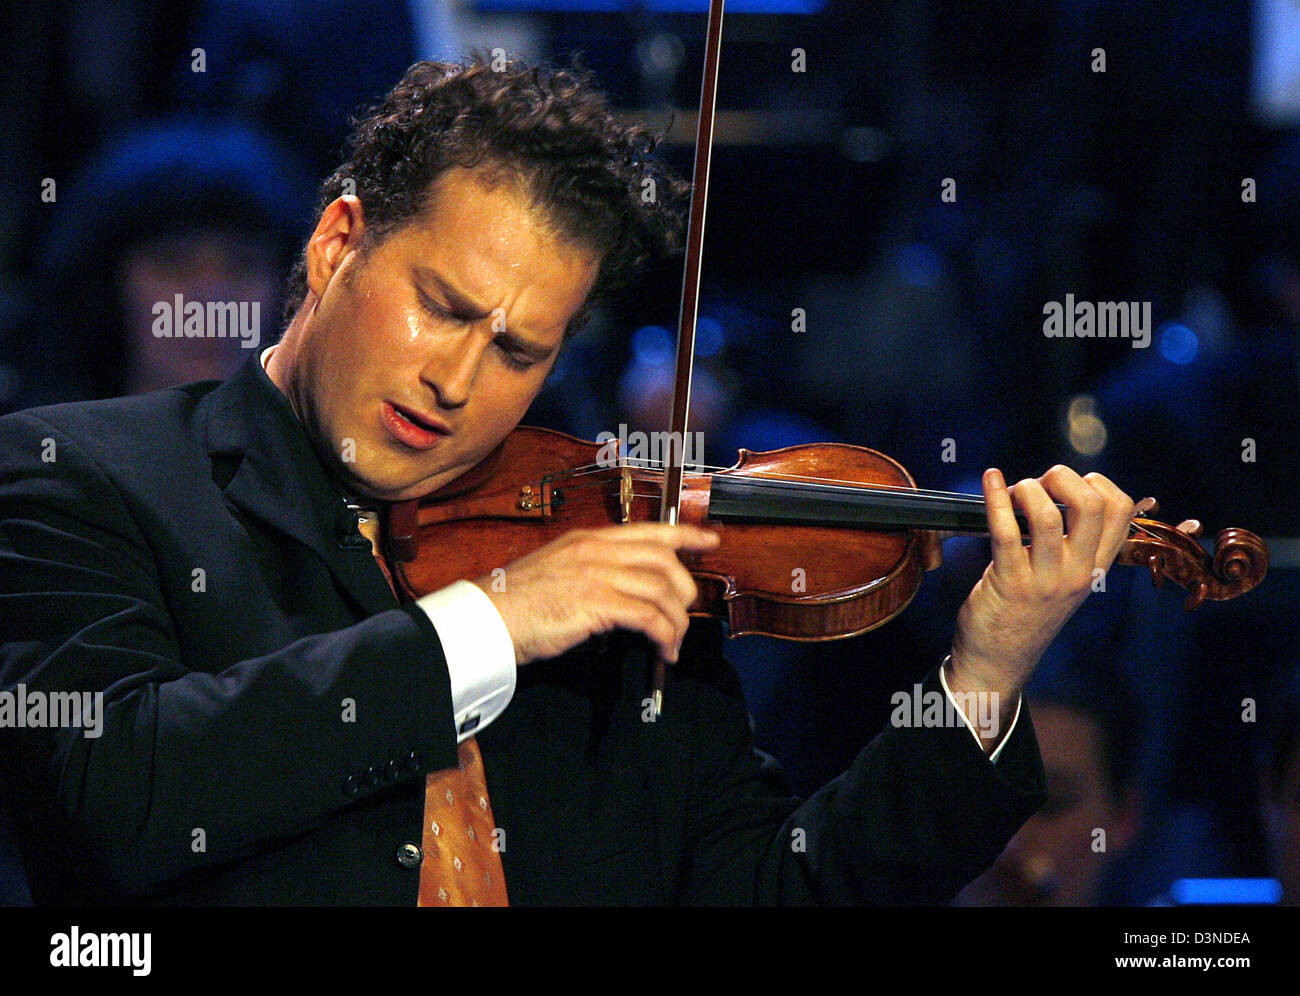 Danish violinist Nikolaj Znaider performs during the taping of German TV show 'A Big Nightmusic' in Munich, - Stock Image